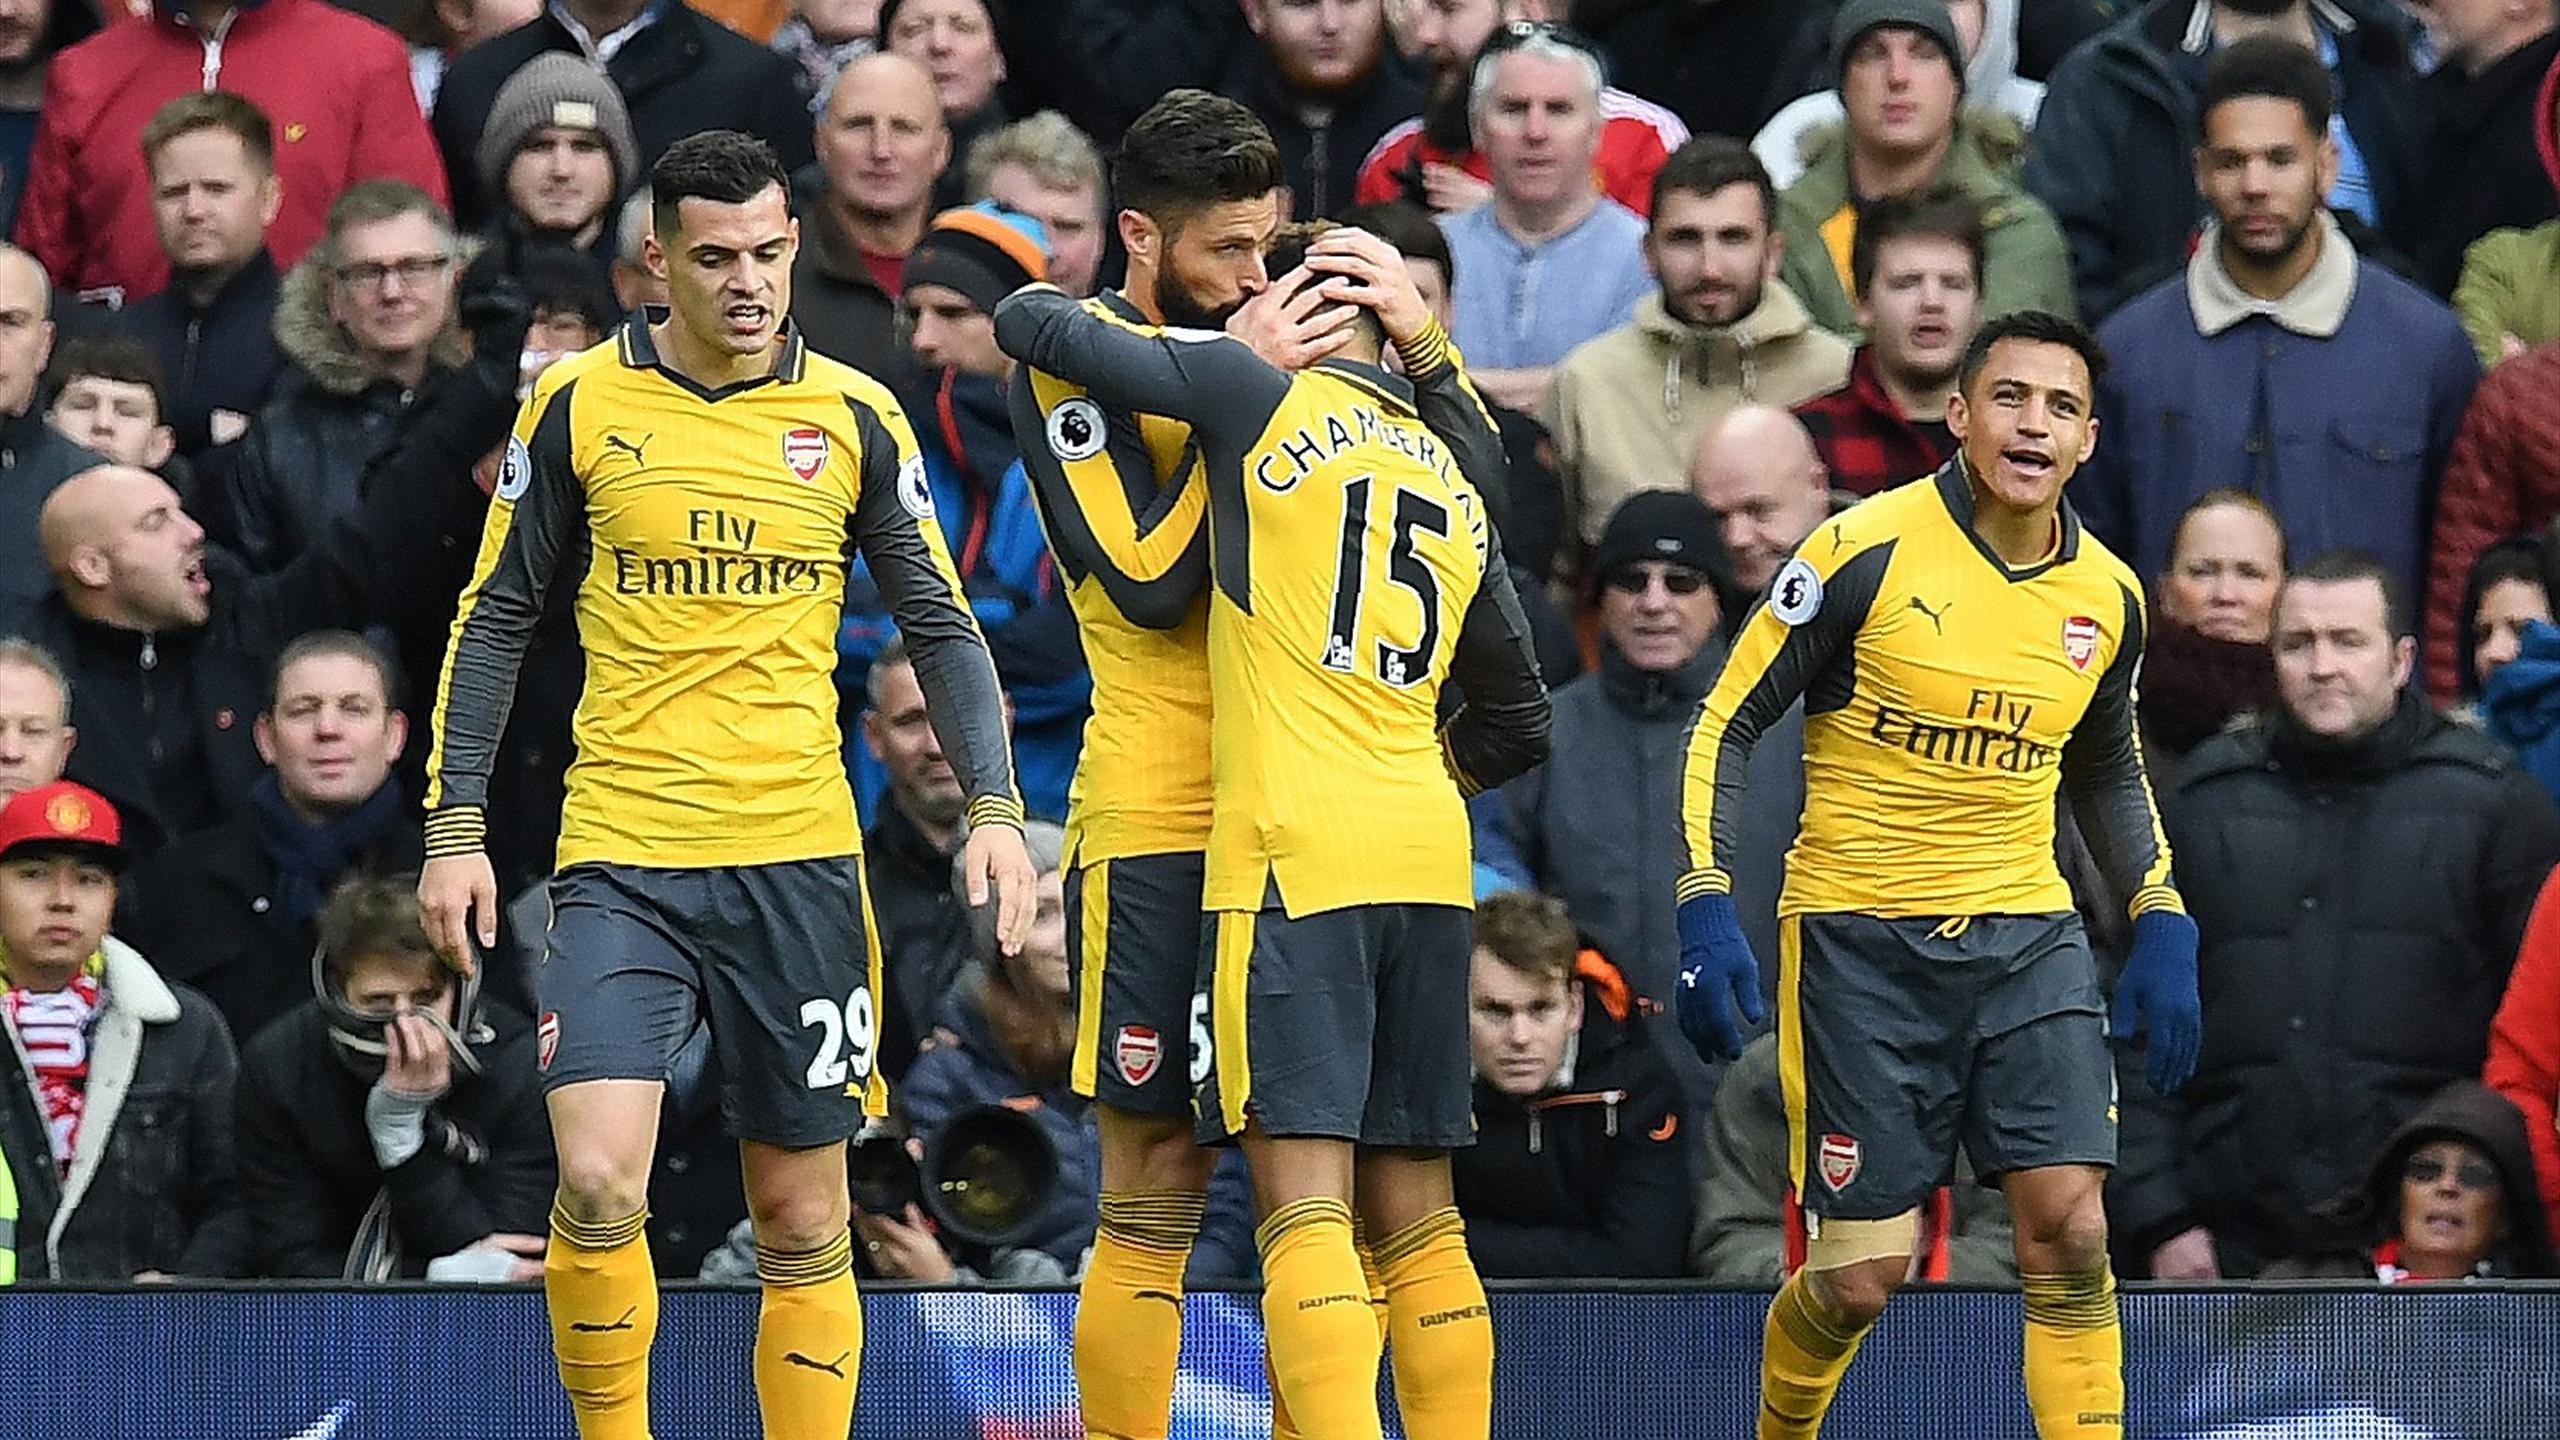 Arsenal's French striker Olivier Giroud (2L) celebrates scoring his team's first goal